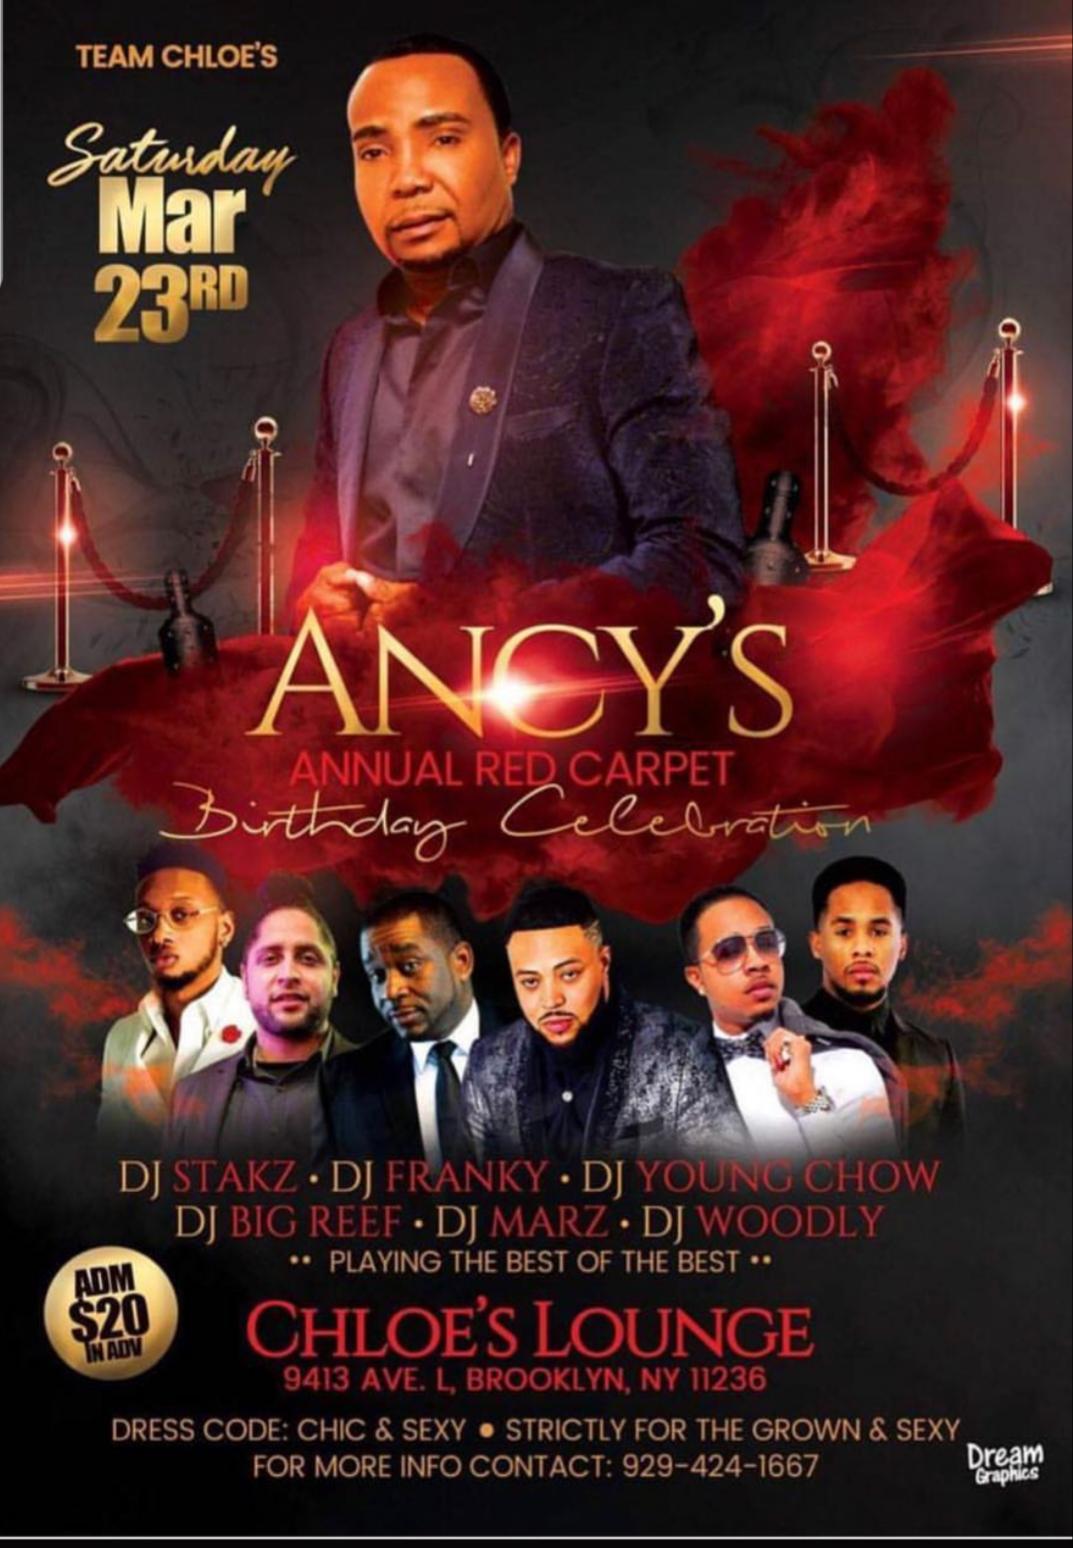 Ancy Birthday Celebration - March 23.jpg